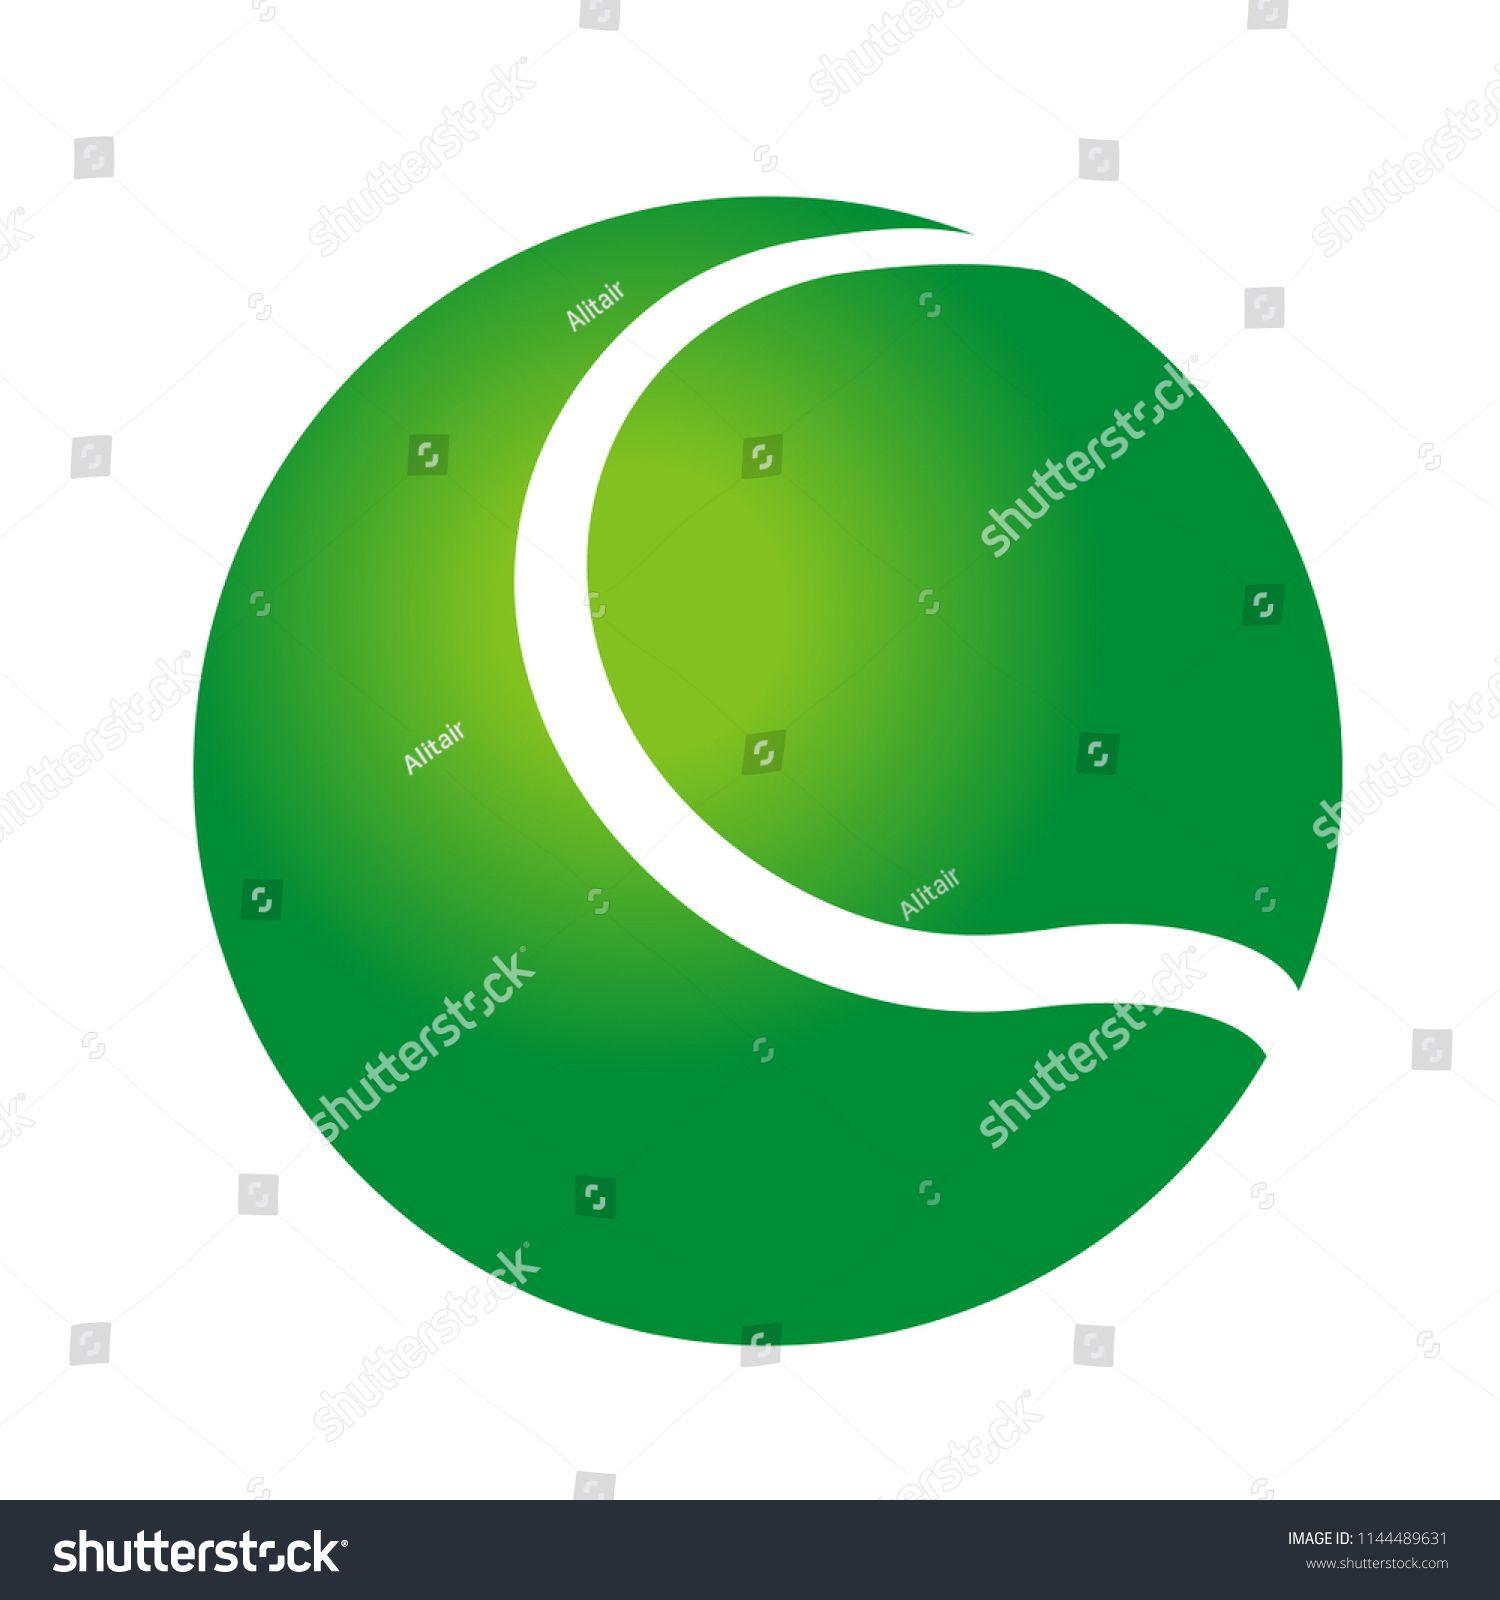 Green Tennis Ball Vector Illustration Ad Spon Tennis Green Ball Illustration In 2020 Brochure Mockup Flyers Photo Editing Stock Photos